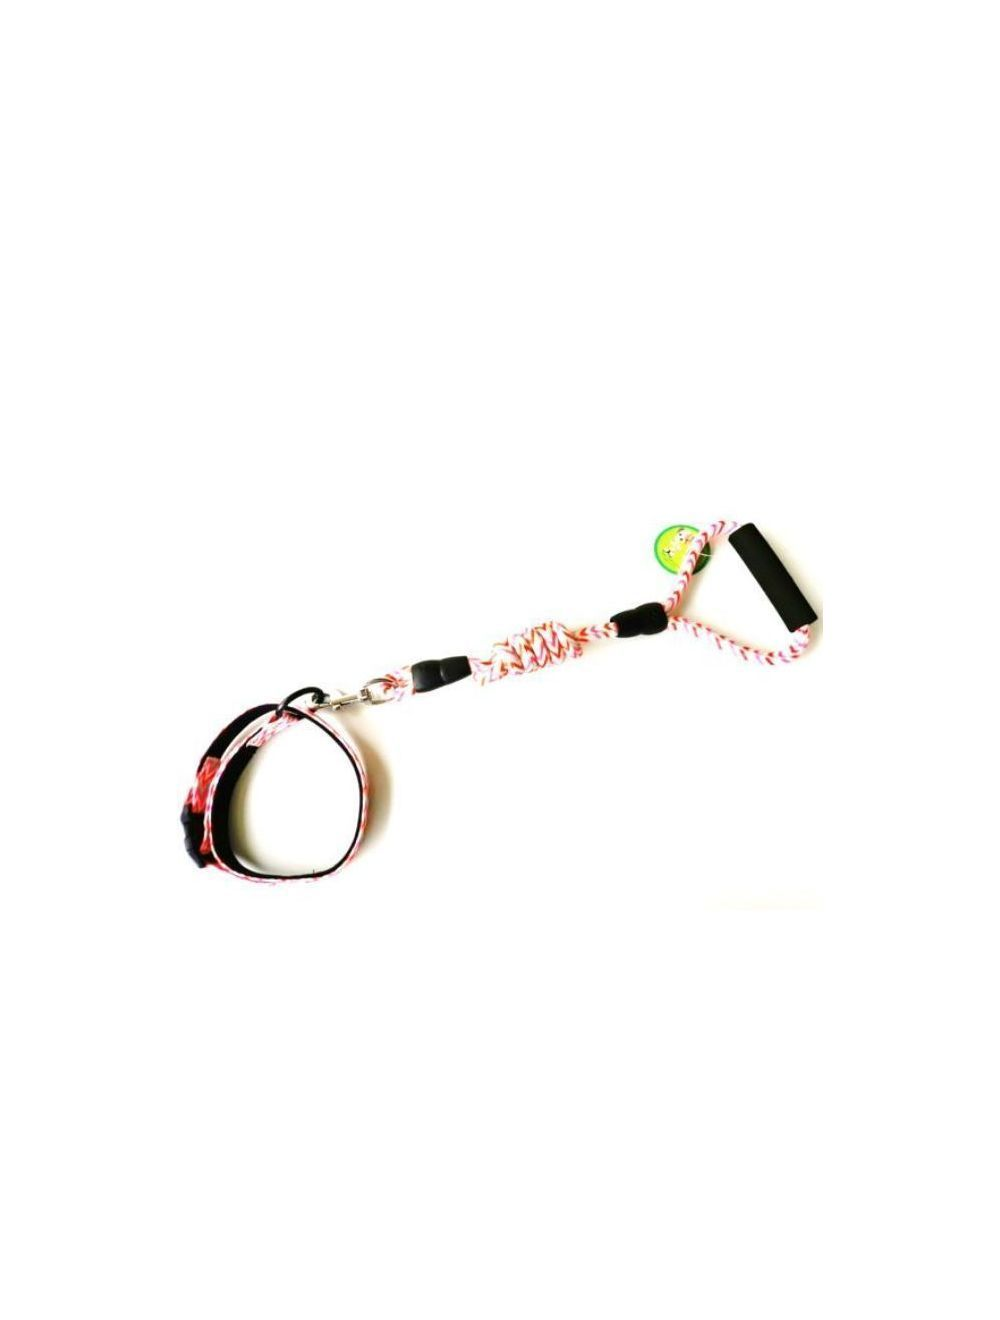 Lazo con collar para tus mascotas - ciudaddemascotas.com